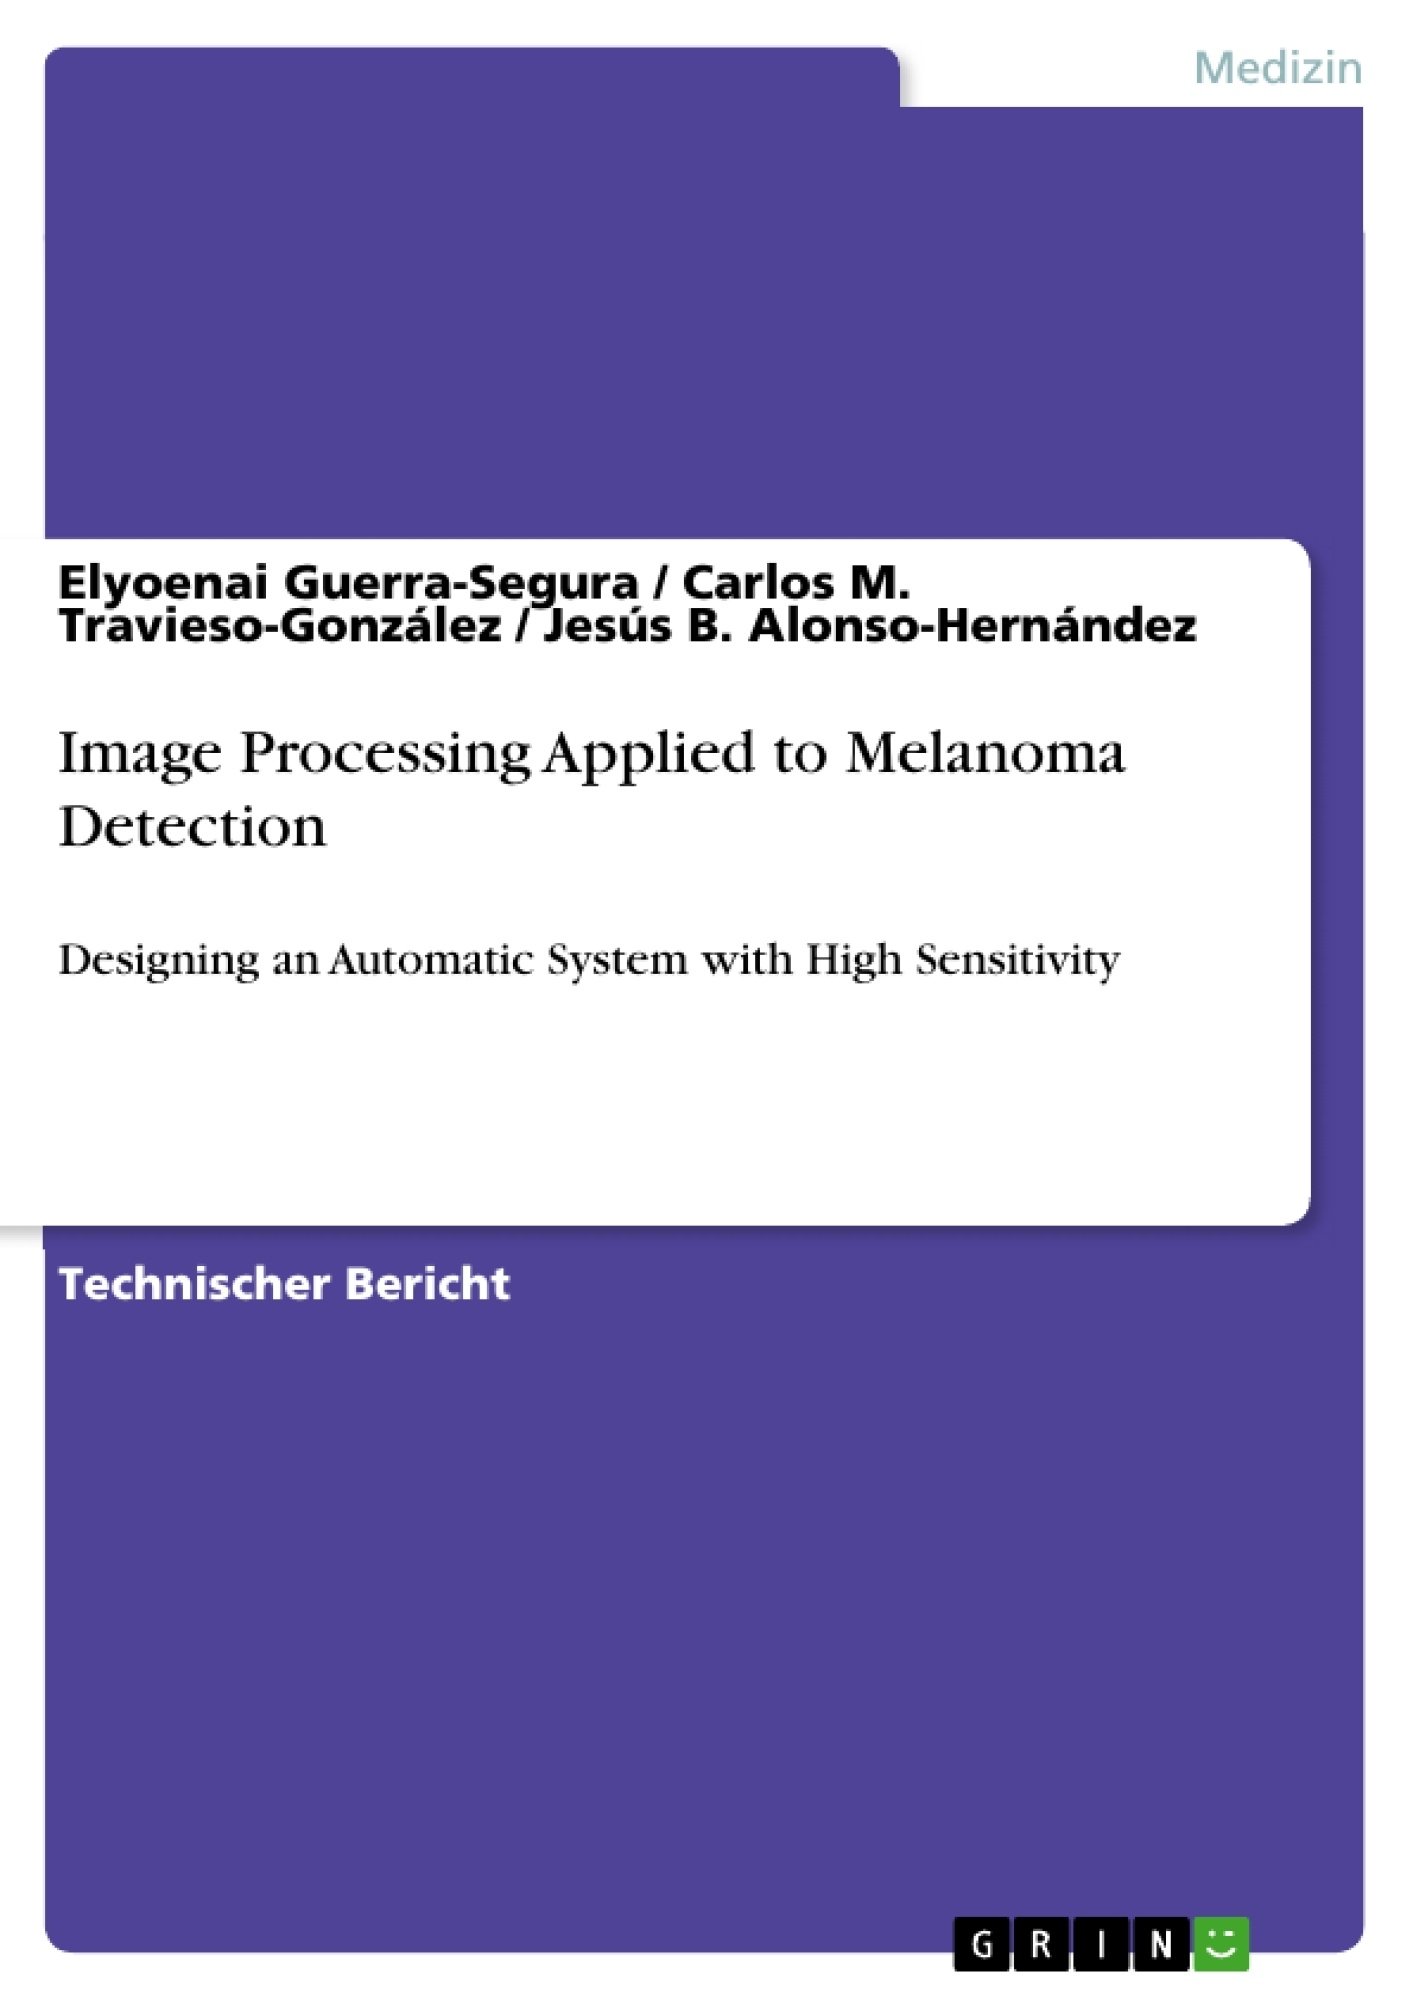 Titel: Image Processing Applied to Melanoma Detection